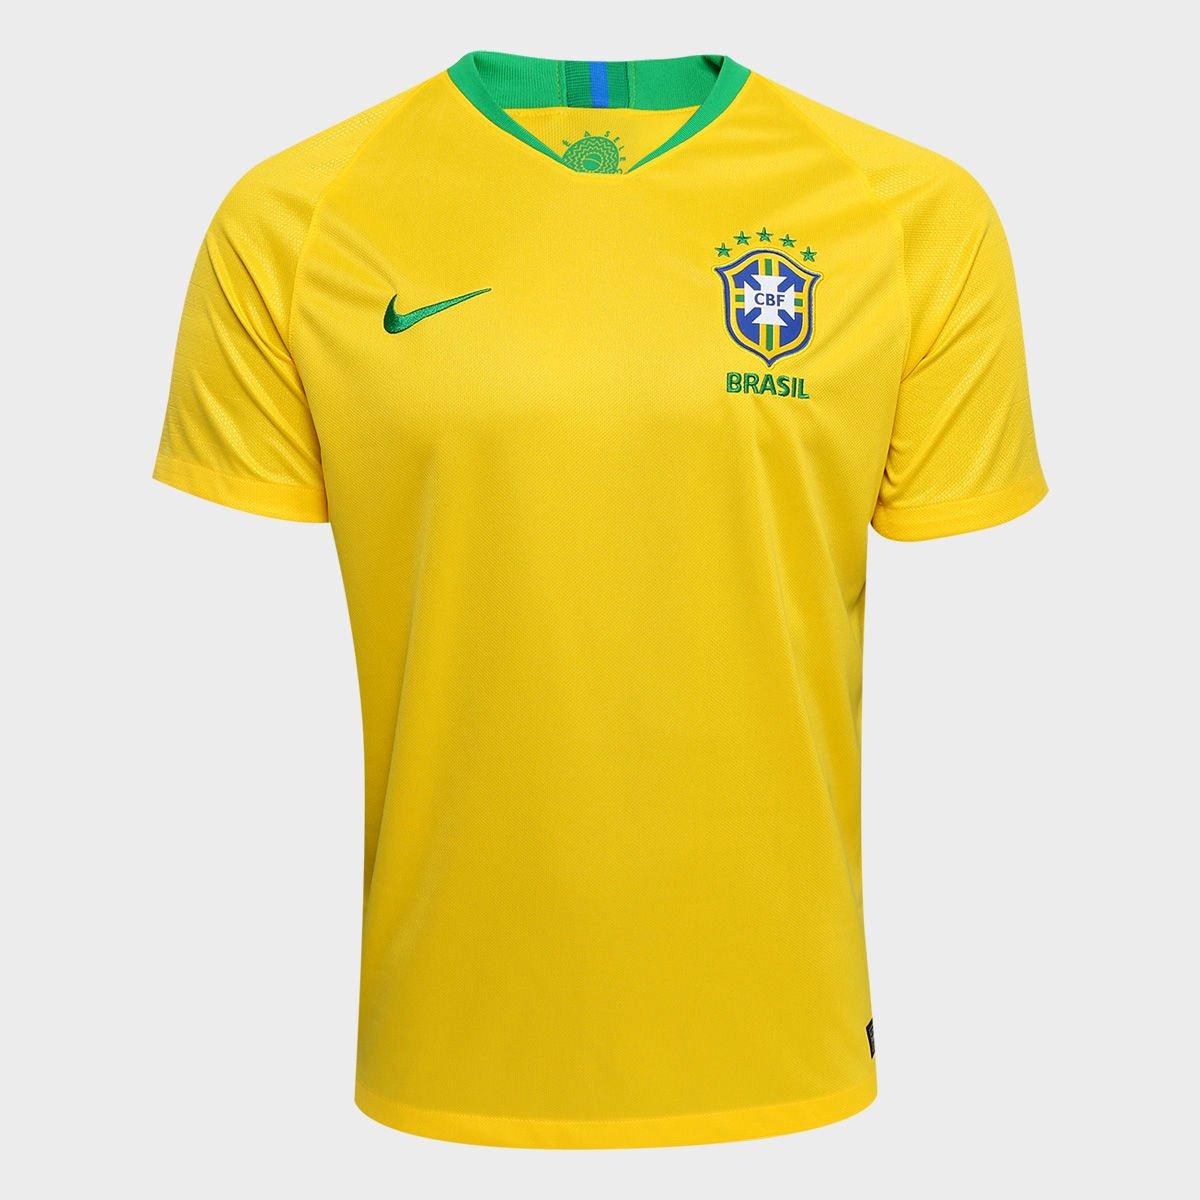 0b7582e292 ... Camisa Seleção Brasil I 2018 nº 14 Danilo - Torcedor Nike Masculina ...